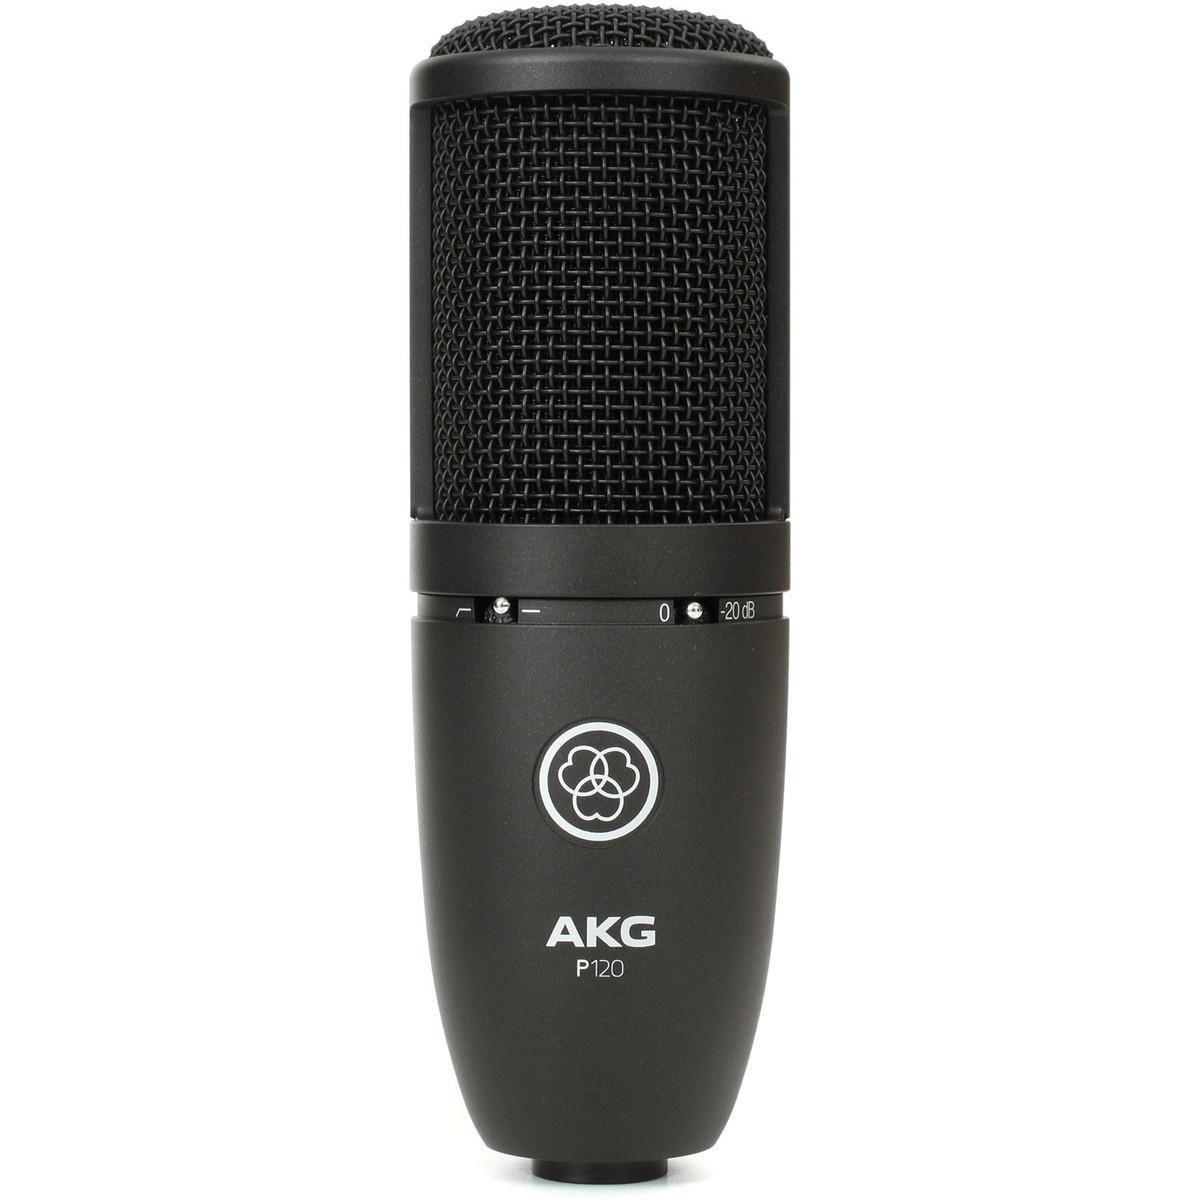 Image of AKG P120 Large Diaphragm Condenser Microphone